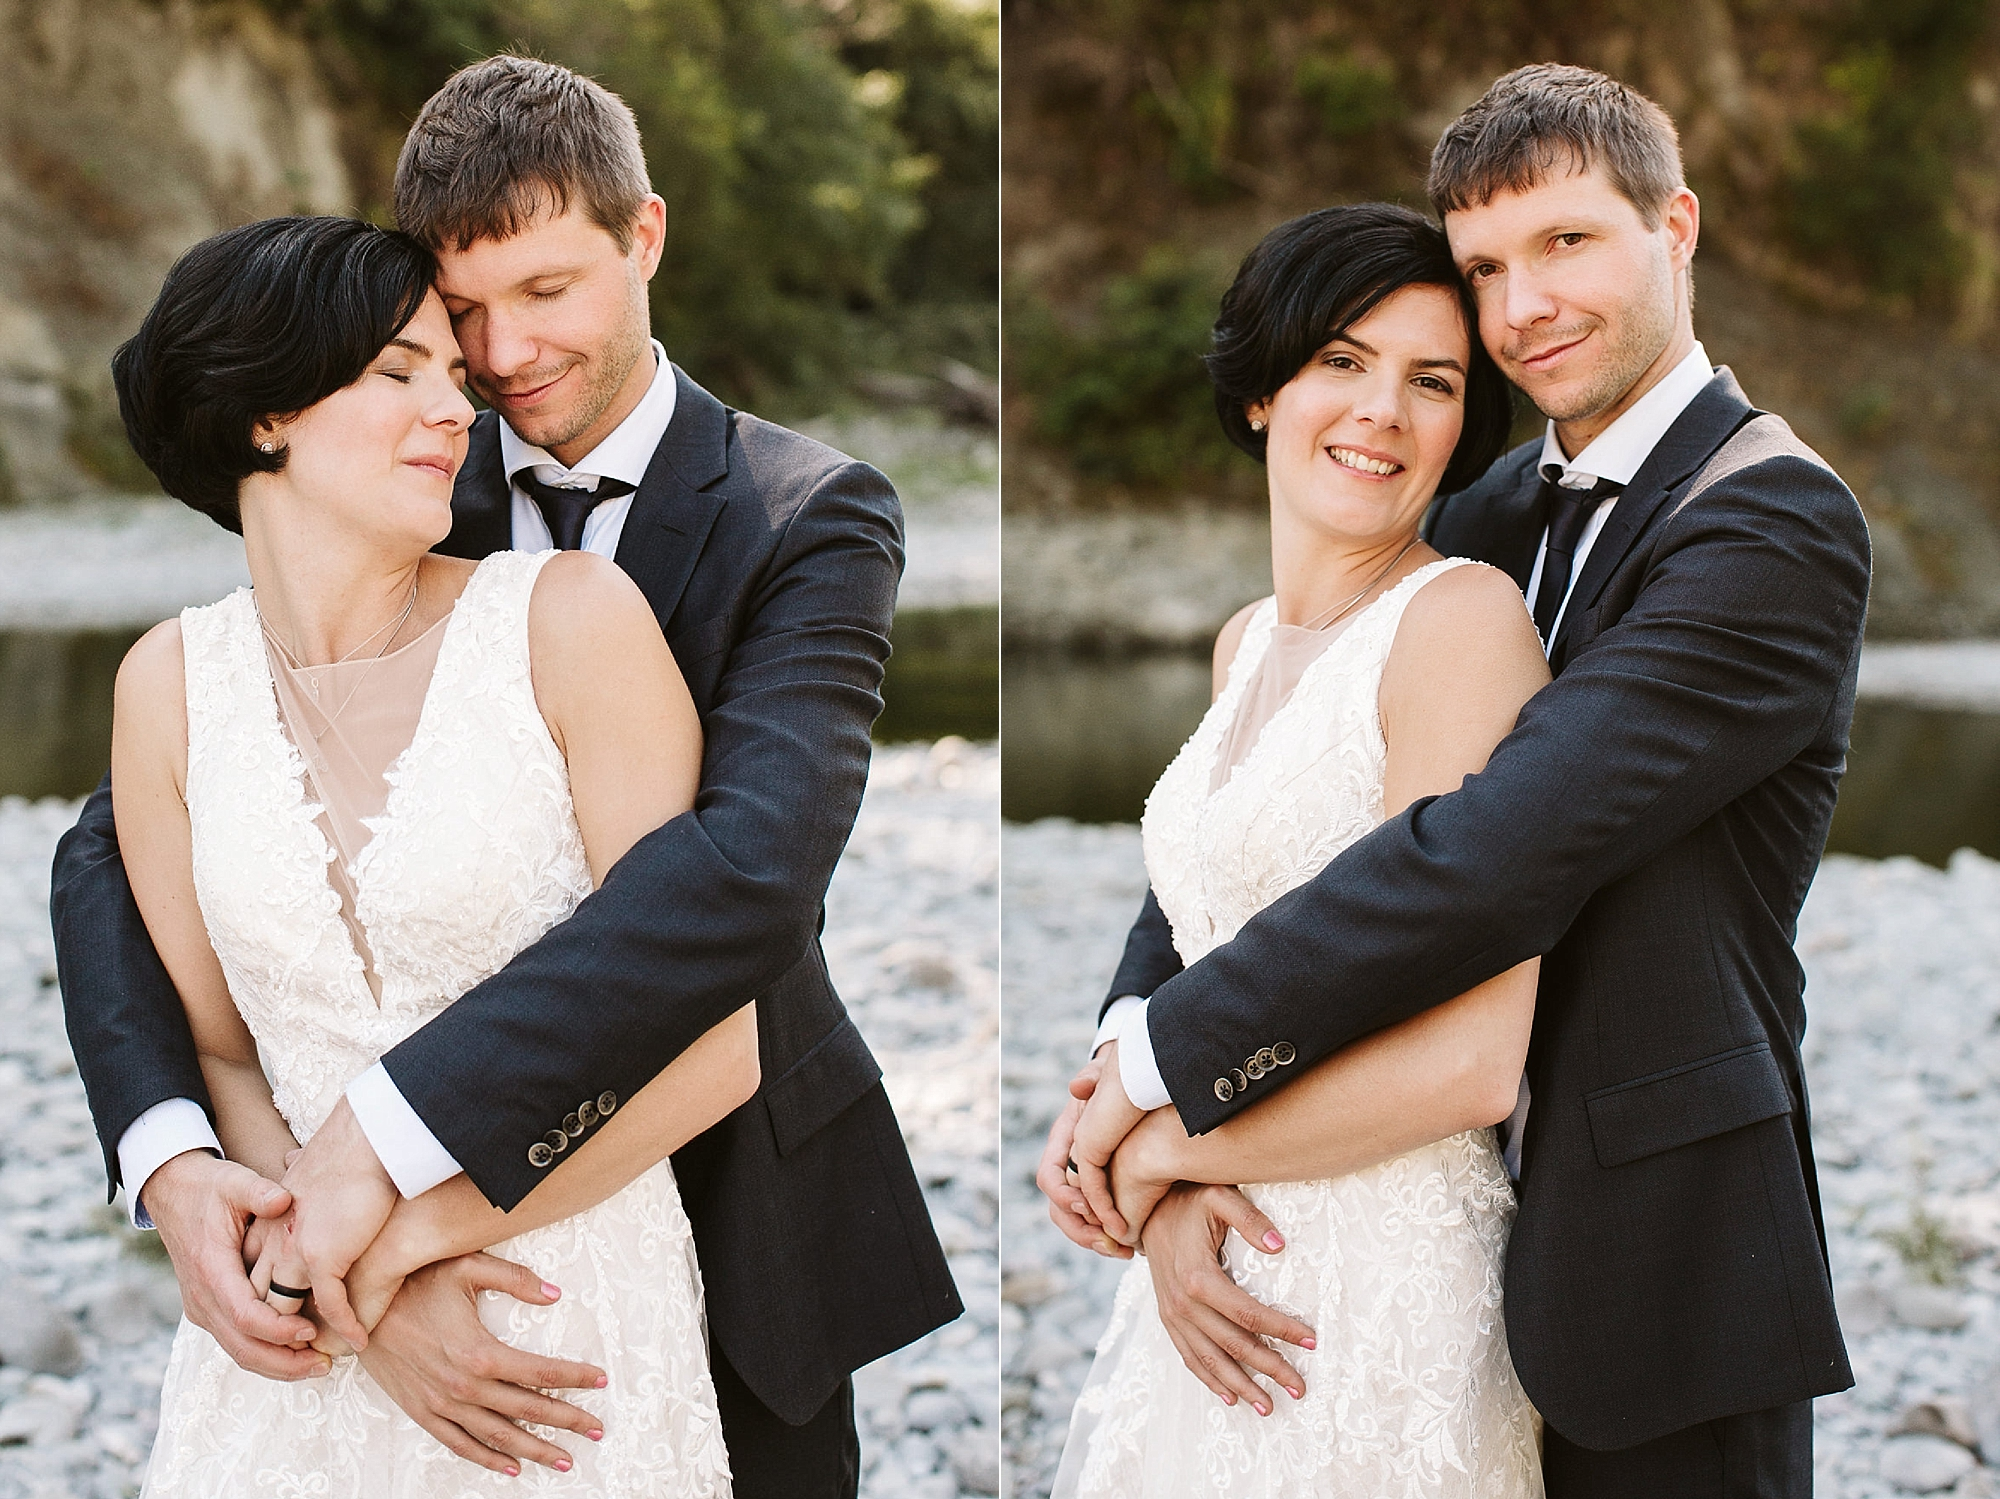 California-wedding-photographer-alfonso-flores-pamplin-groove-259.jpg